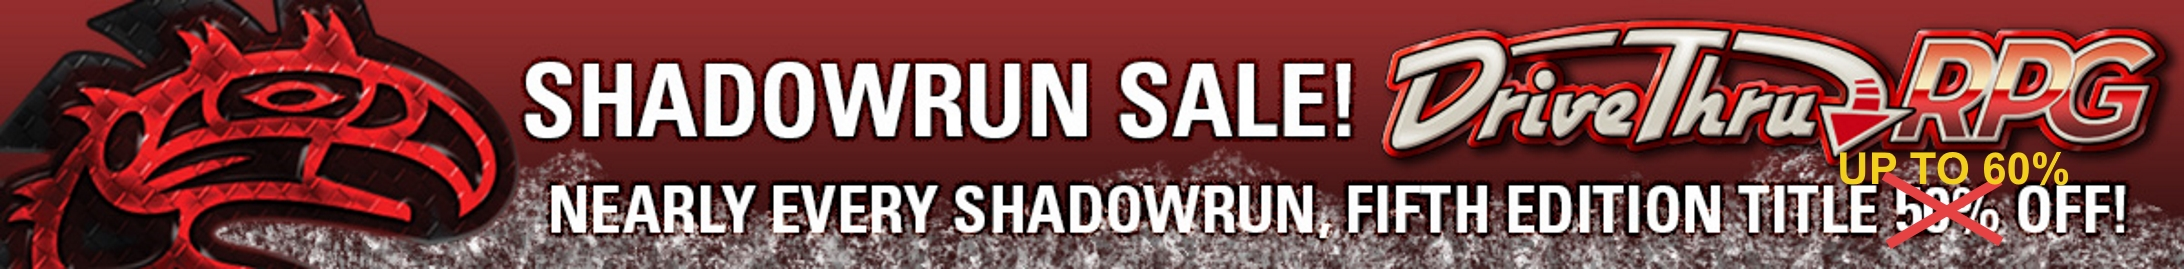 SR5 Complete Your Collection Sale @ DriveThruRPG.com